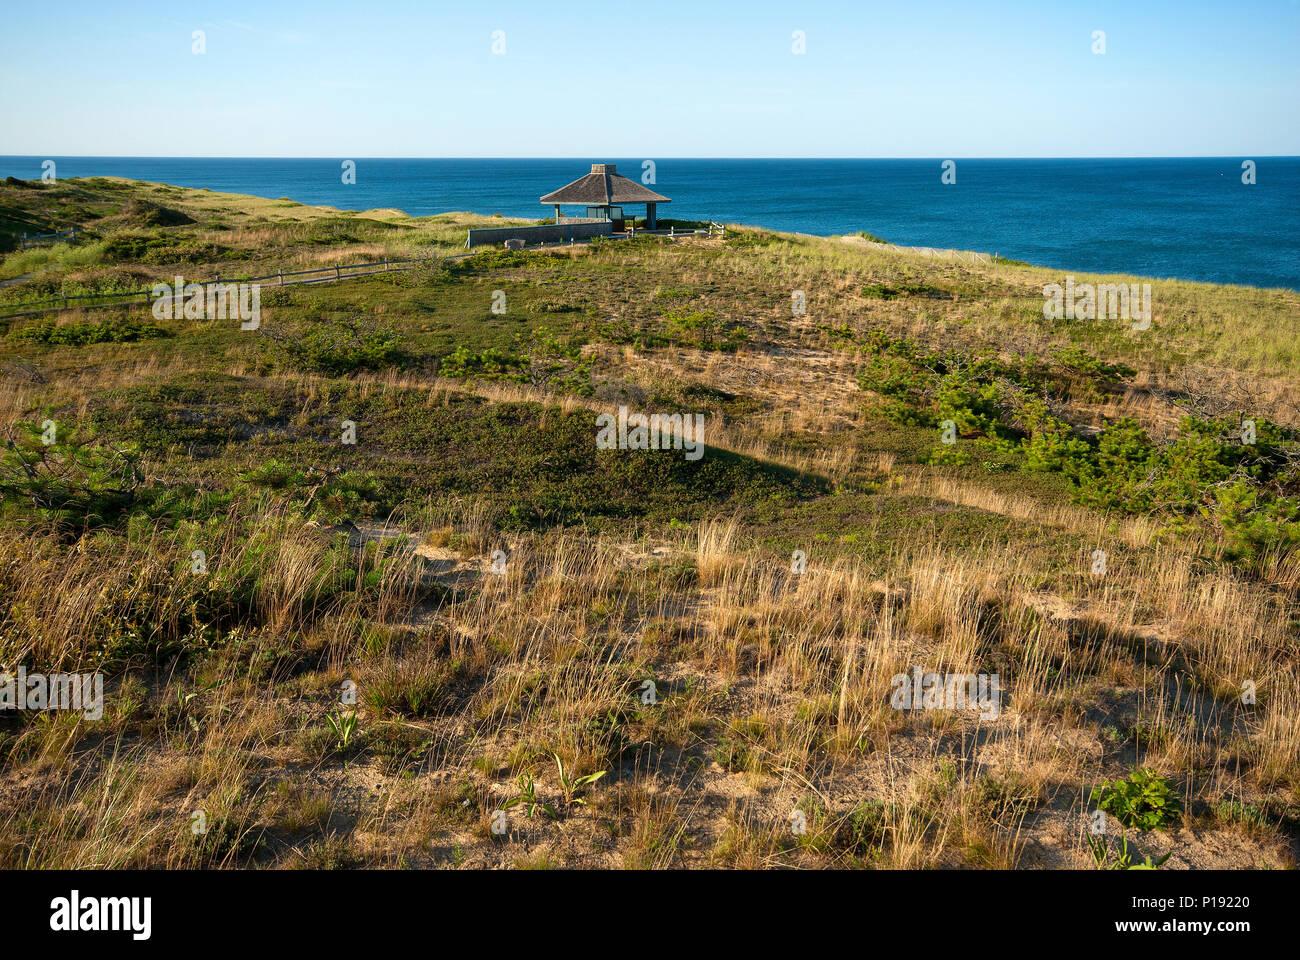 Marconi beach with Marconi Transatlantic Wireless Telegraph Station, Wellfleet, Barnstable County, Cape Cod National Seashore, Massachusetts, USA - Stock Image